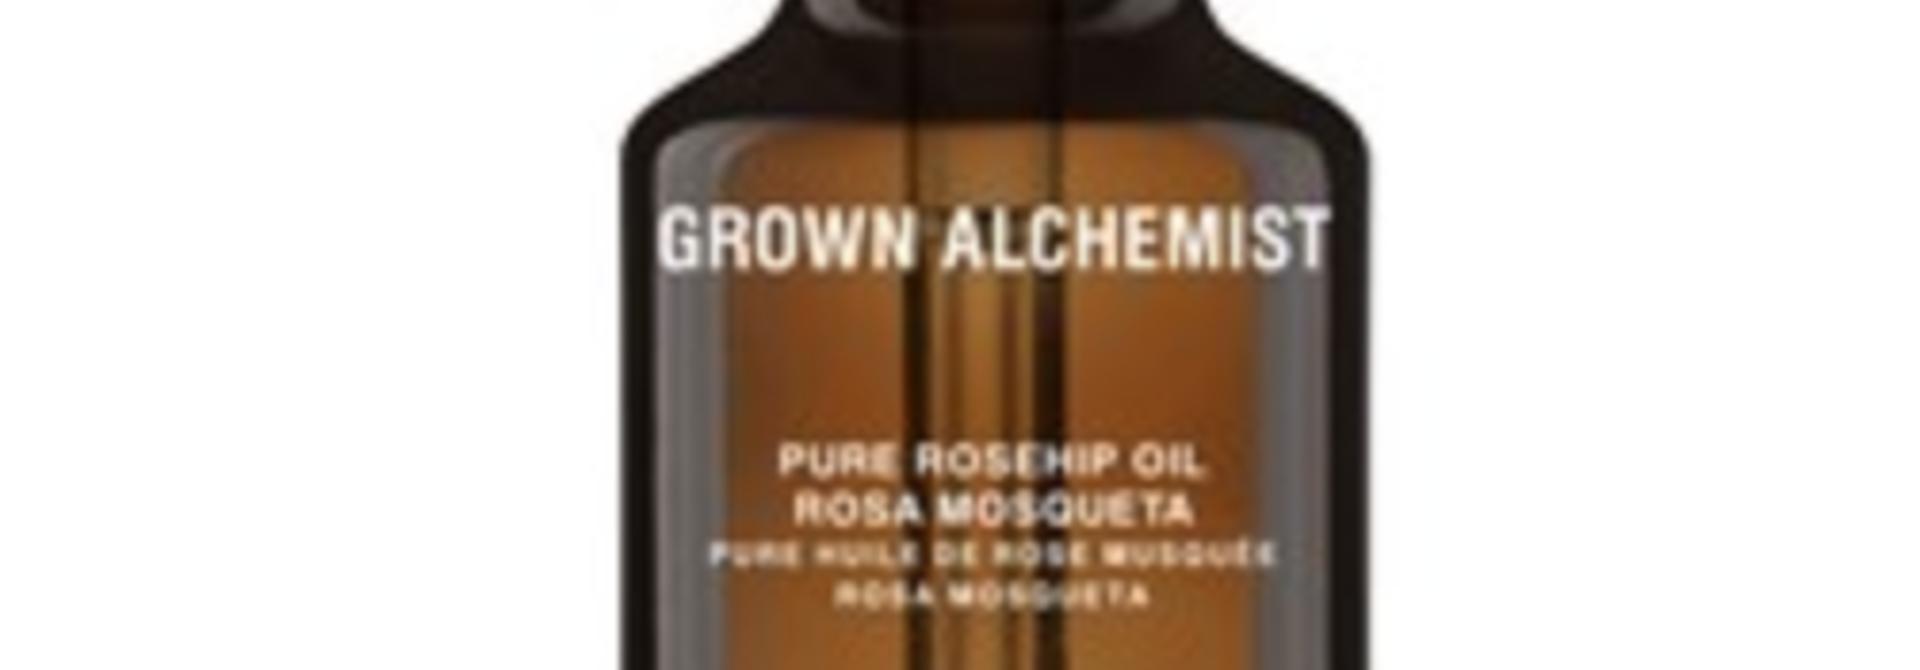 Pure Rosehip Oil: Rosa Mosqueta 25 ml